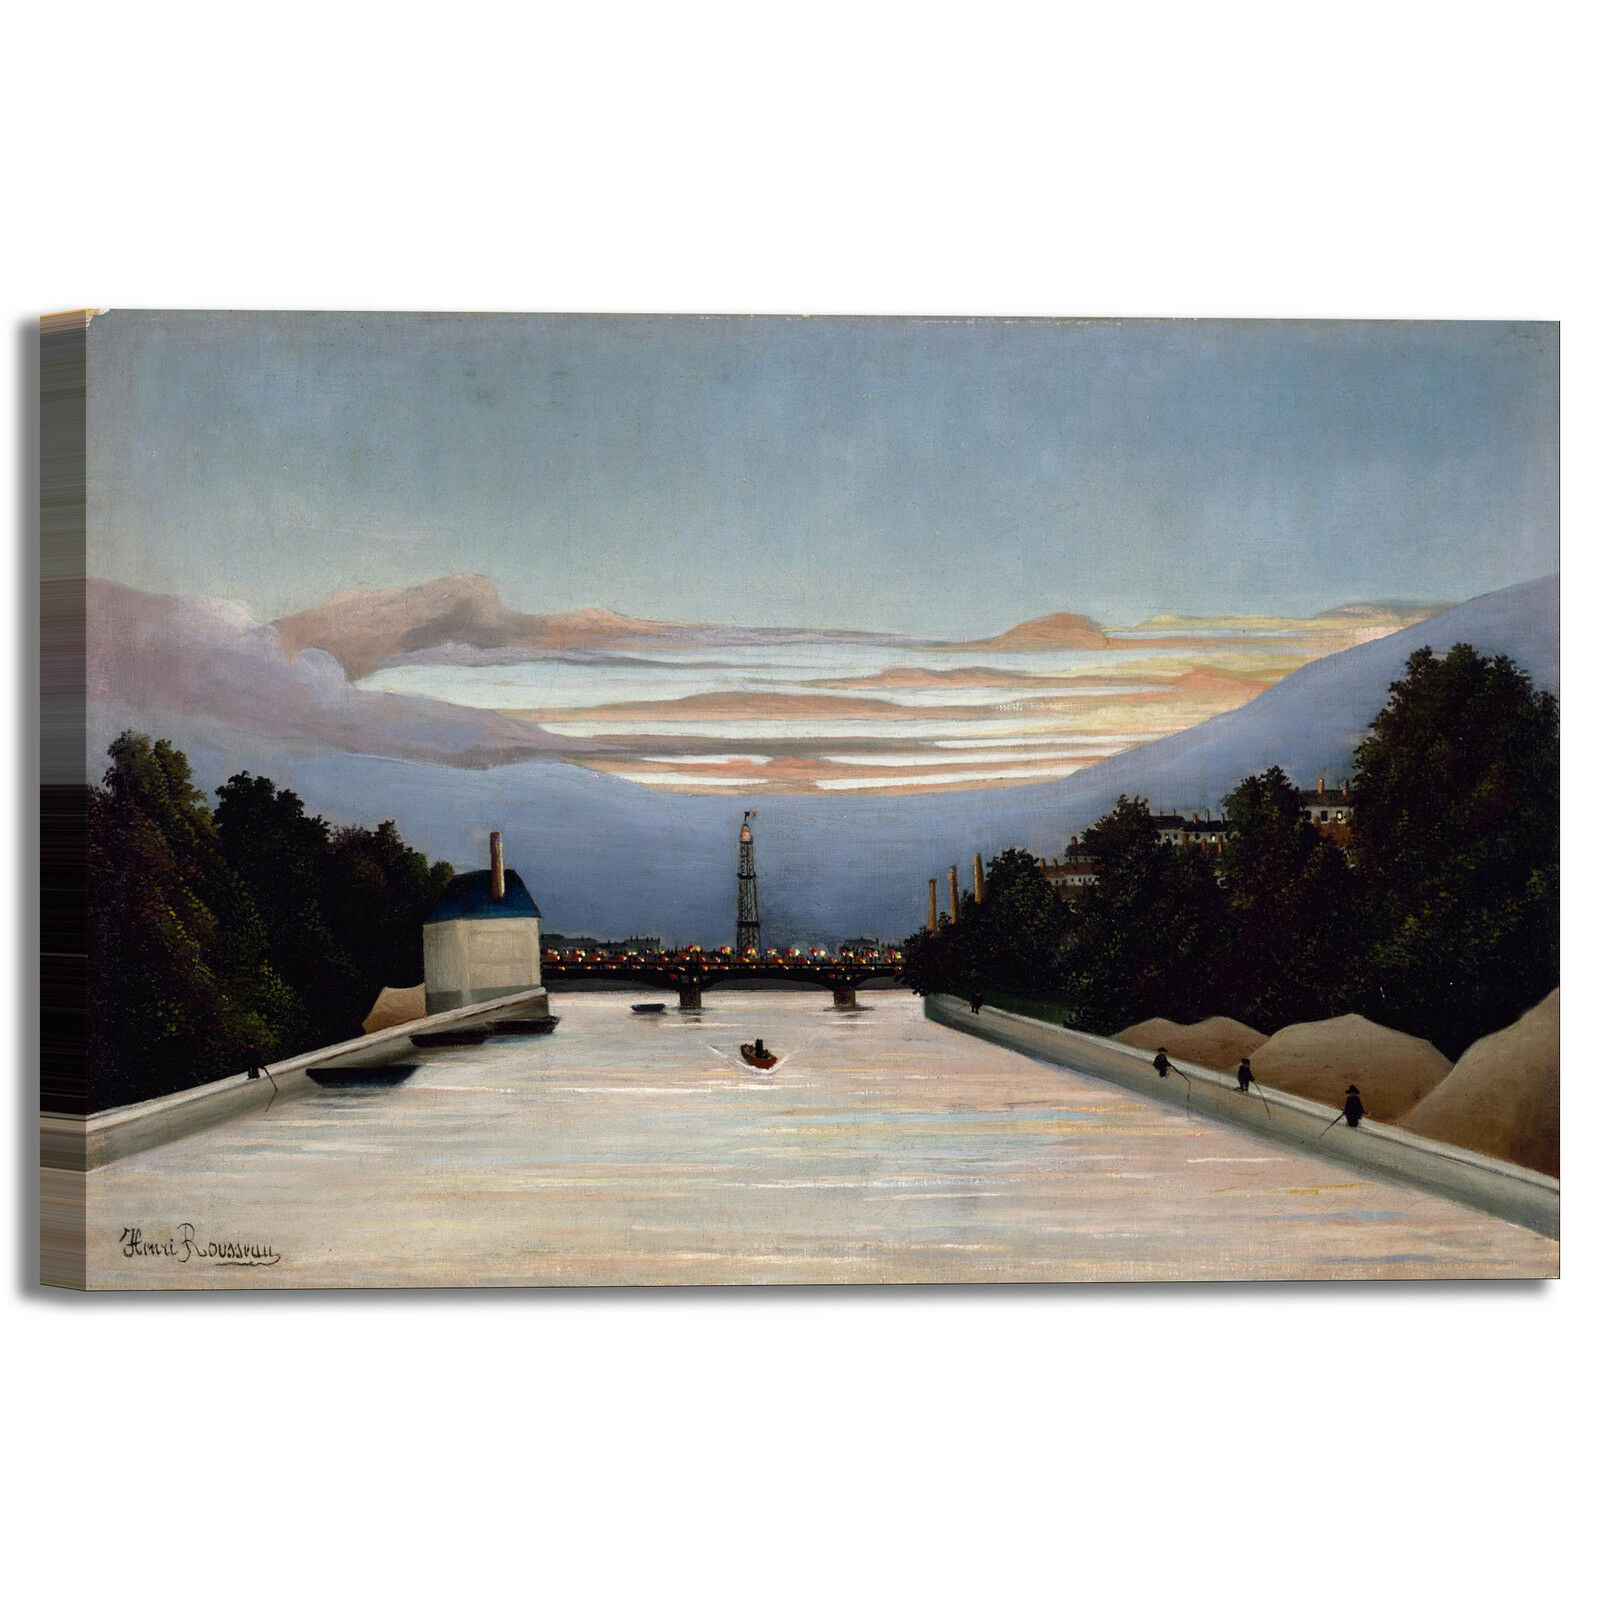 Rousseau Tour Eiffel arRouge design quadro stampa tela dipinto telaio arRouge Eiffel o casa 747ce5